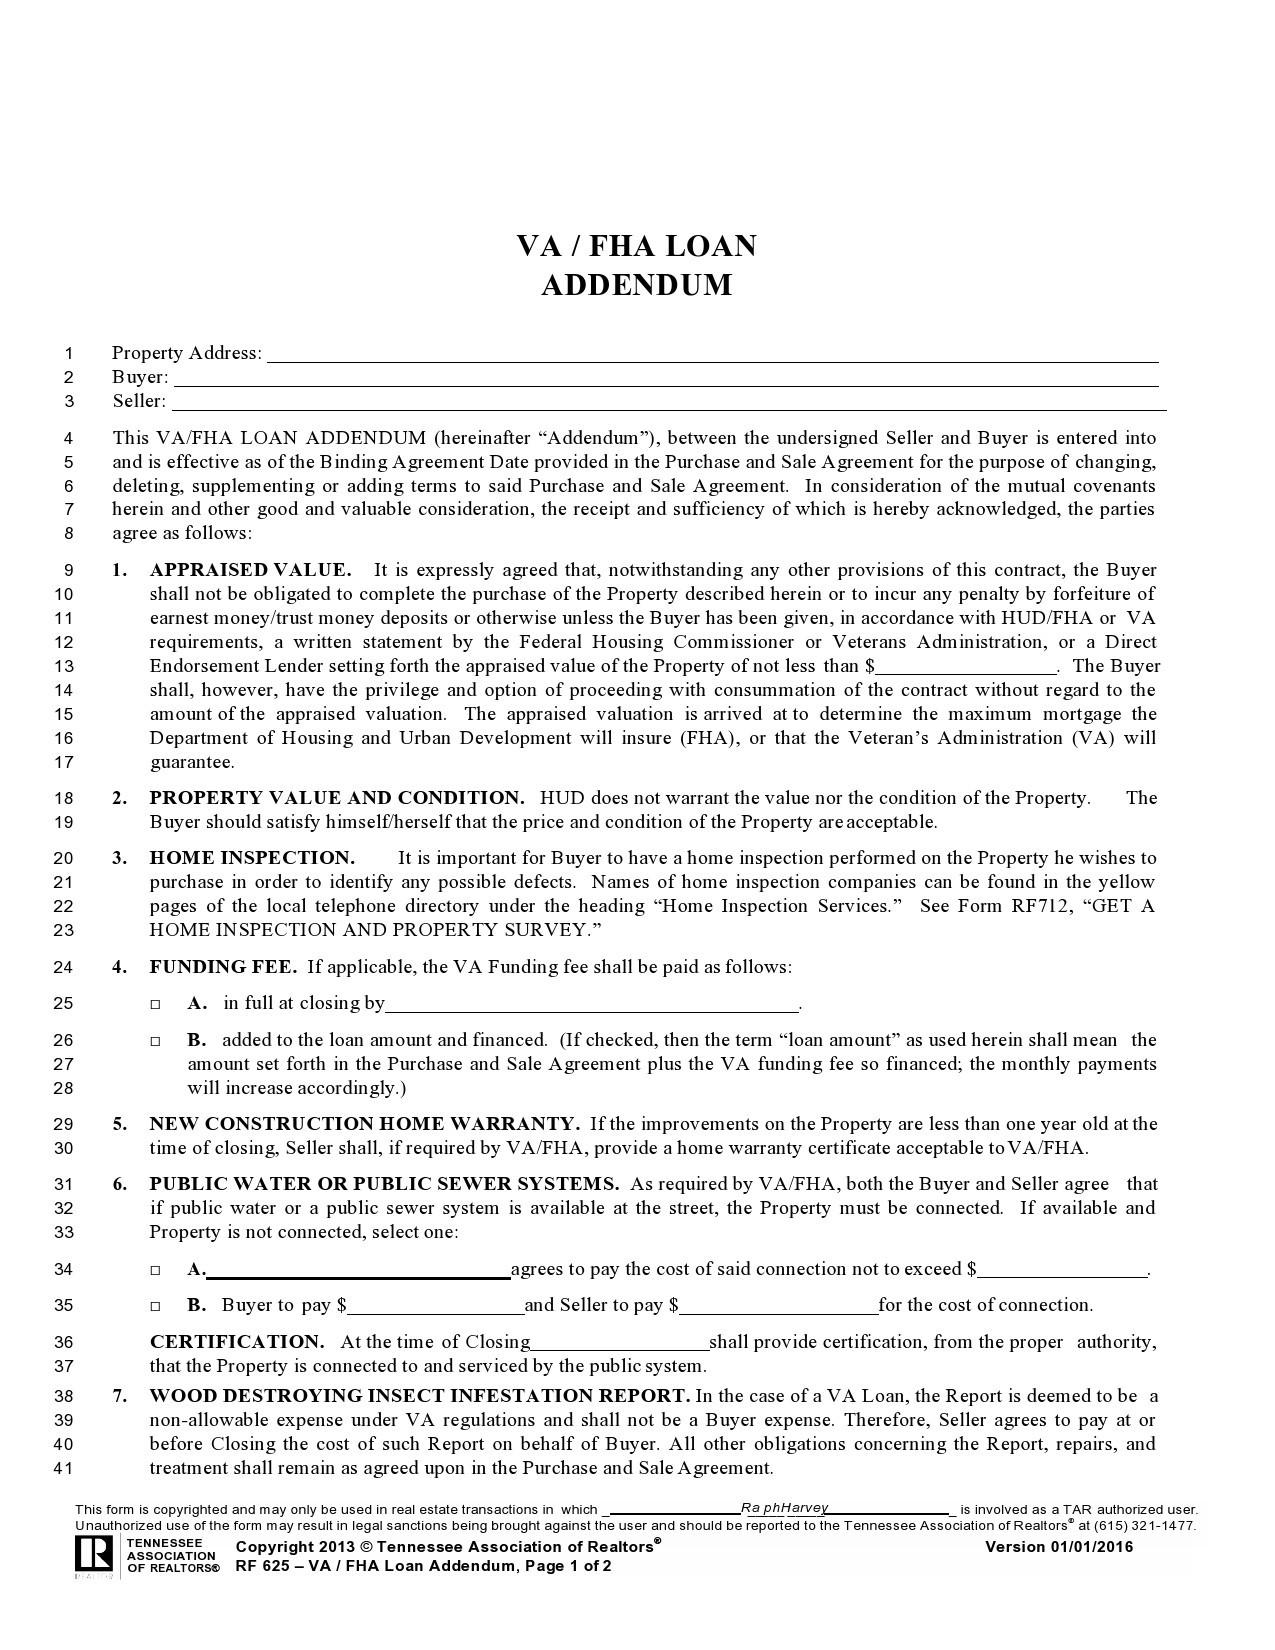 Free seller financing addendum 30